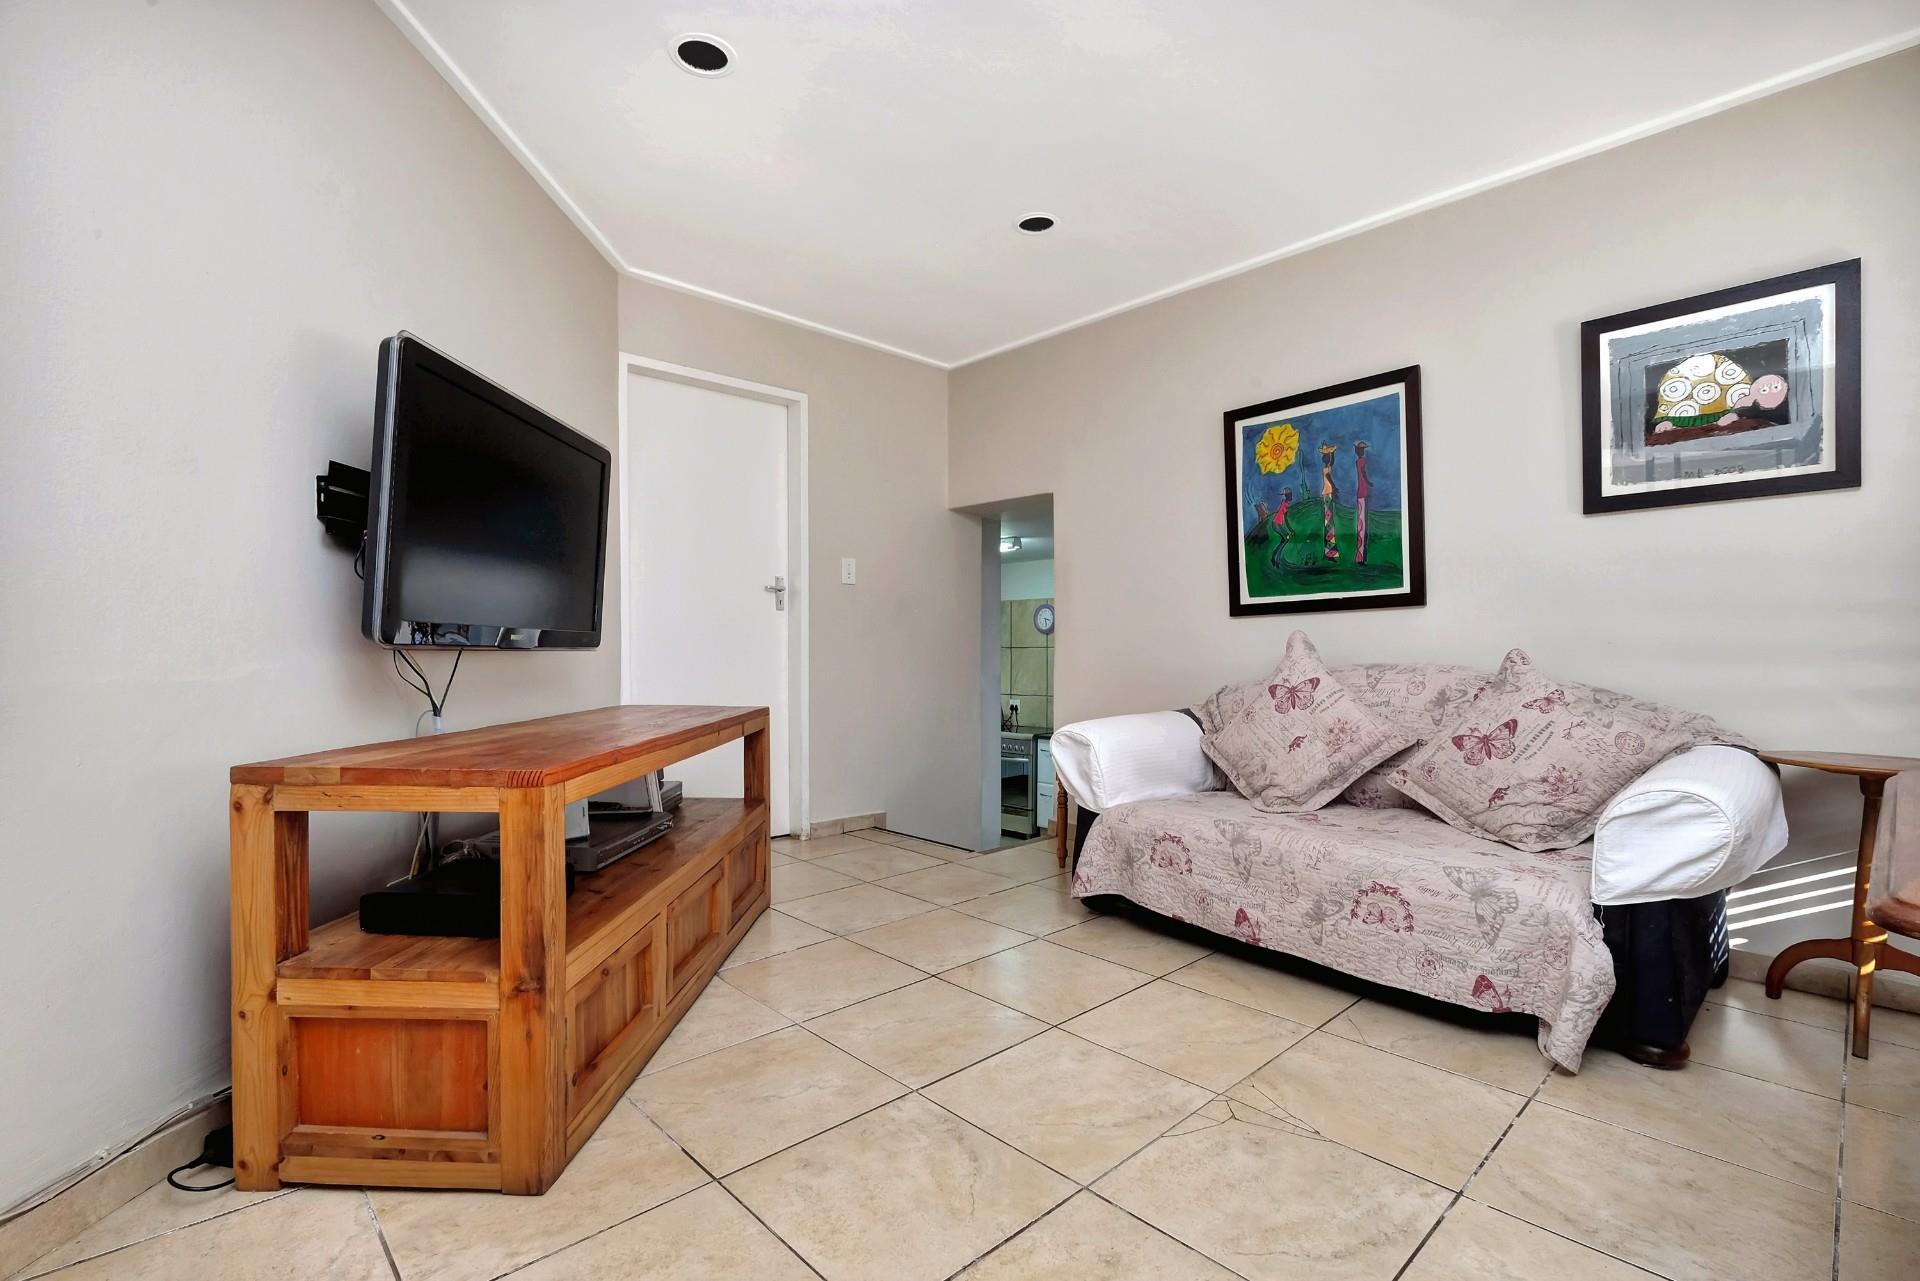 4 Bedroom House For Sale in Hurlingham Manor